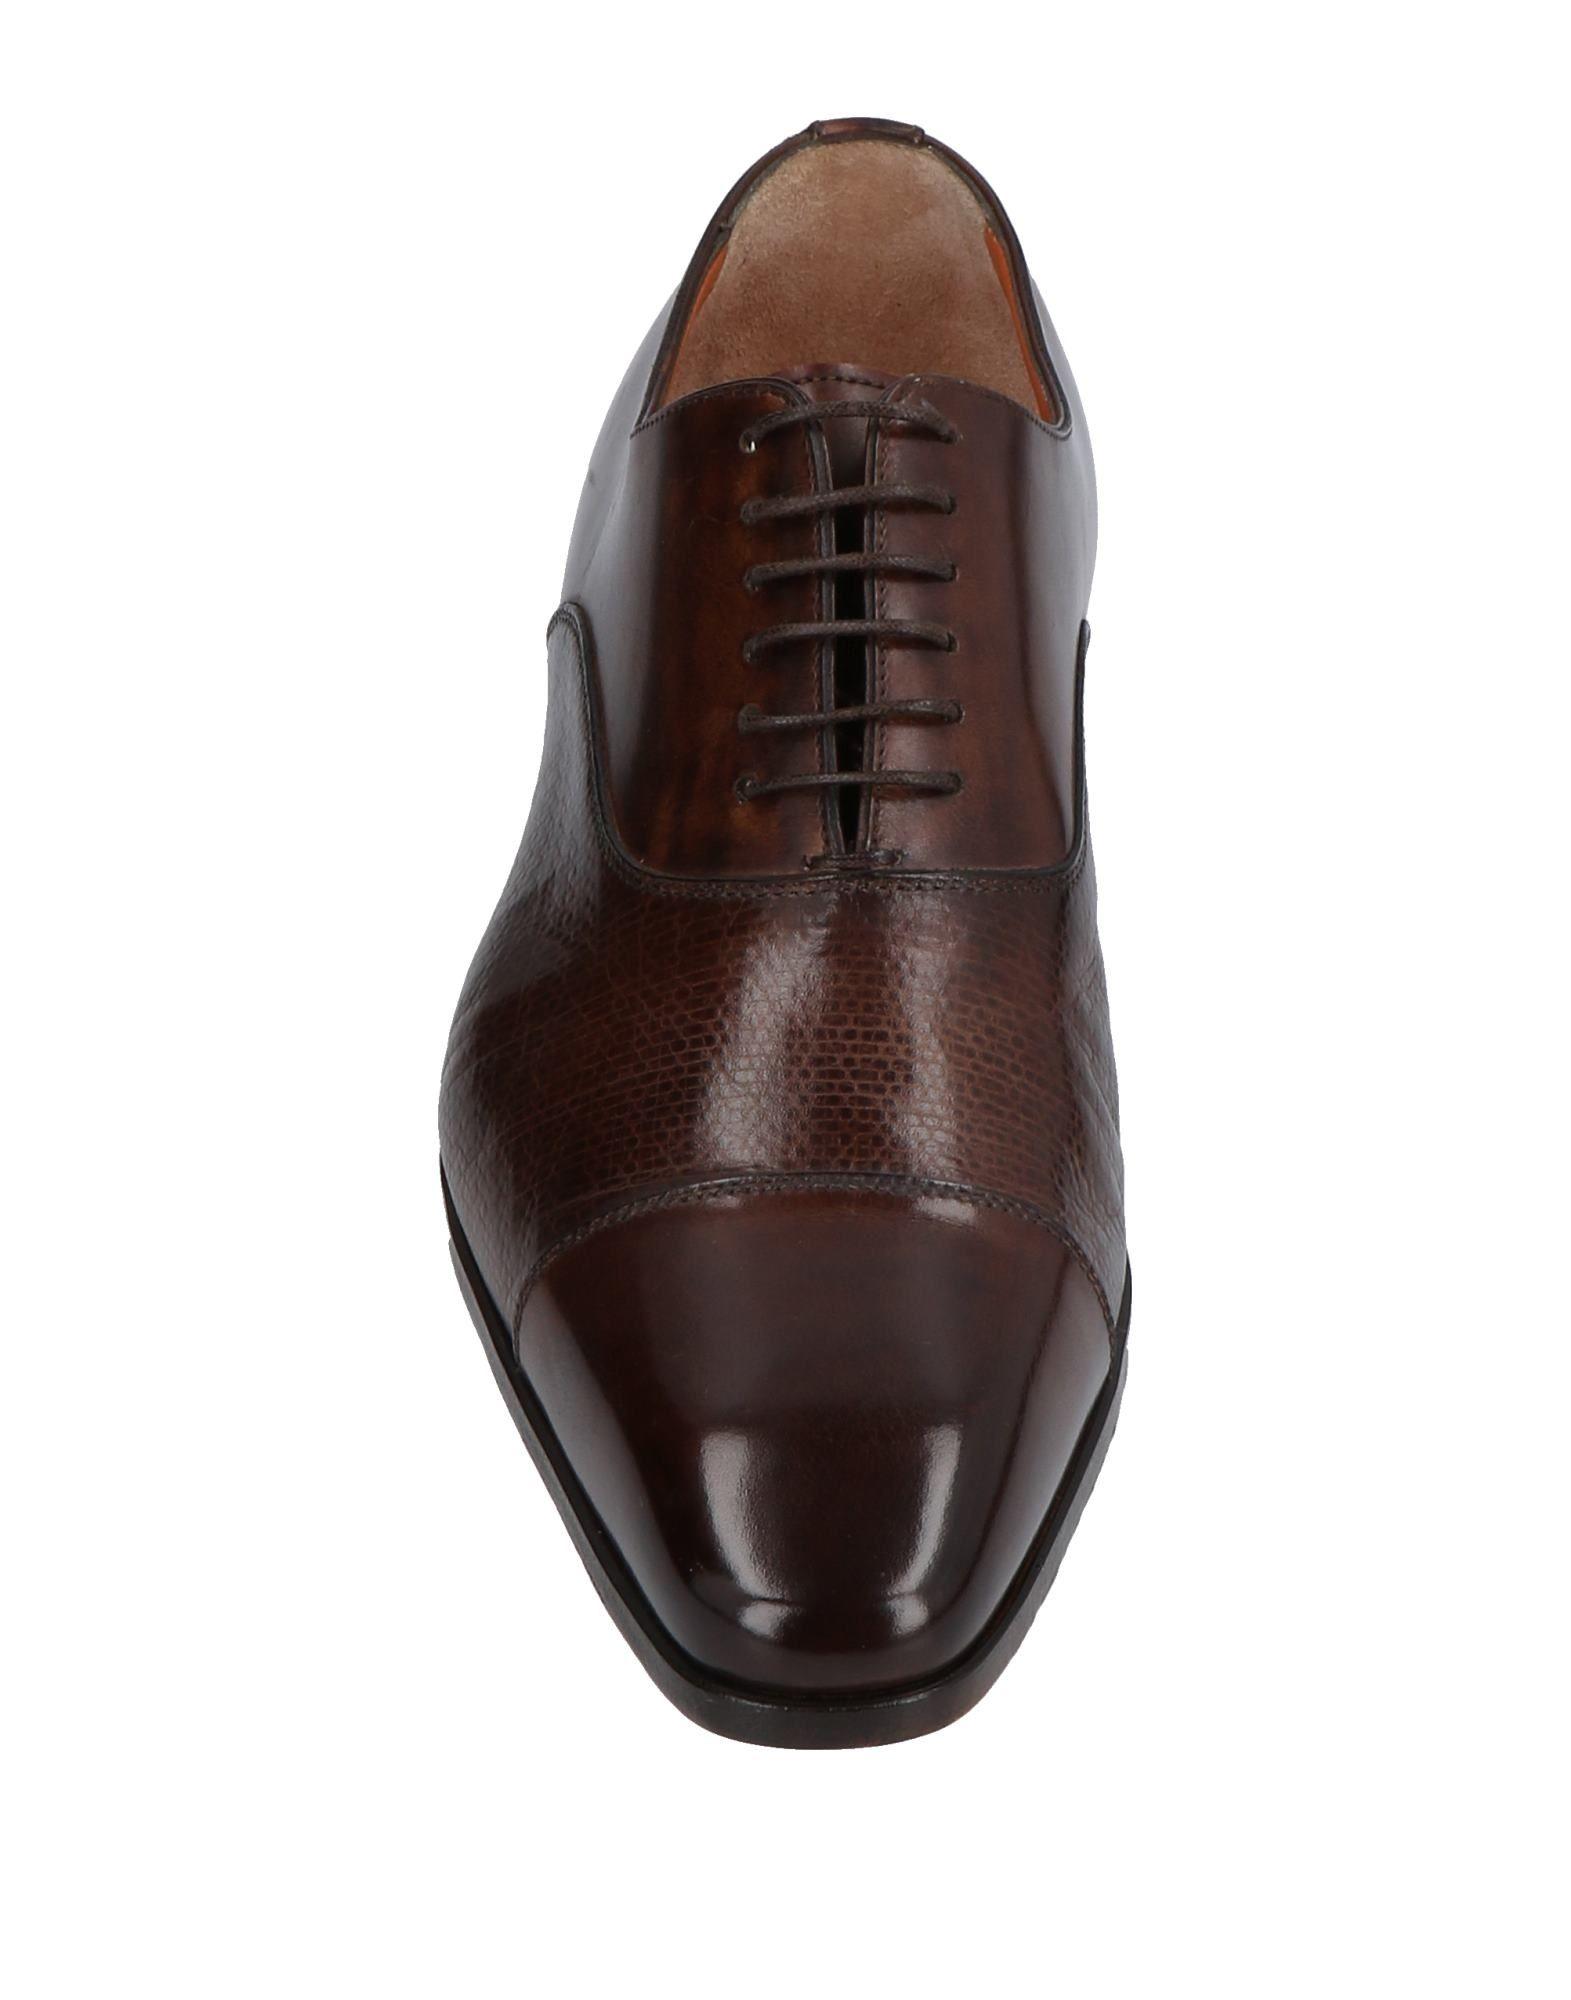 Santoni Gute Schnürschuhe Herren  11478693KN Gute Santoni Qualität beliebte Schuhe 2432fb